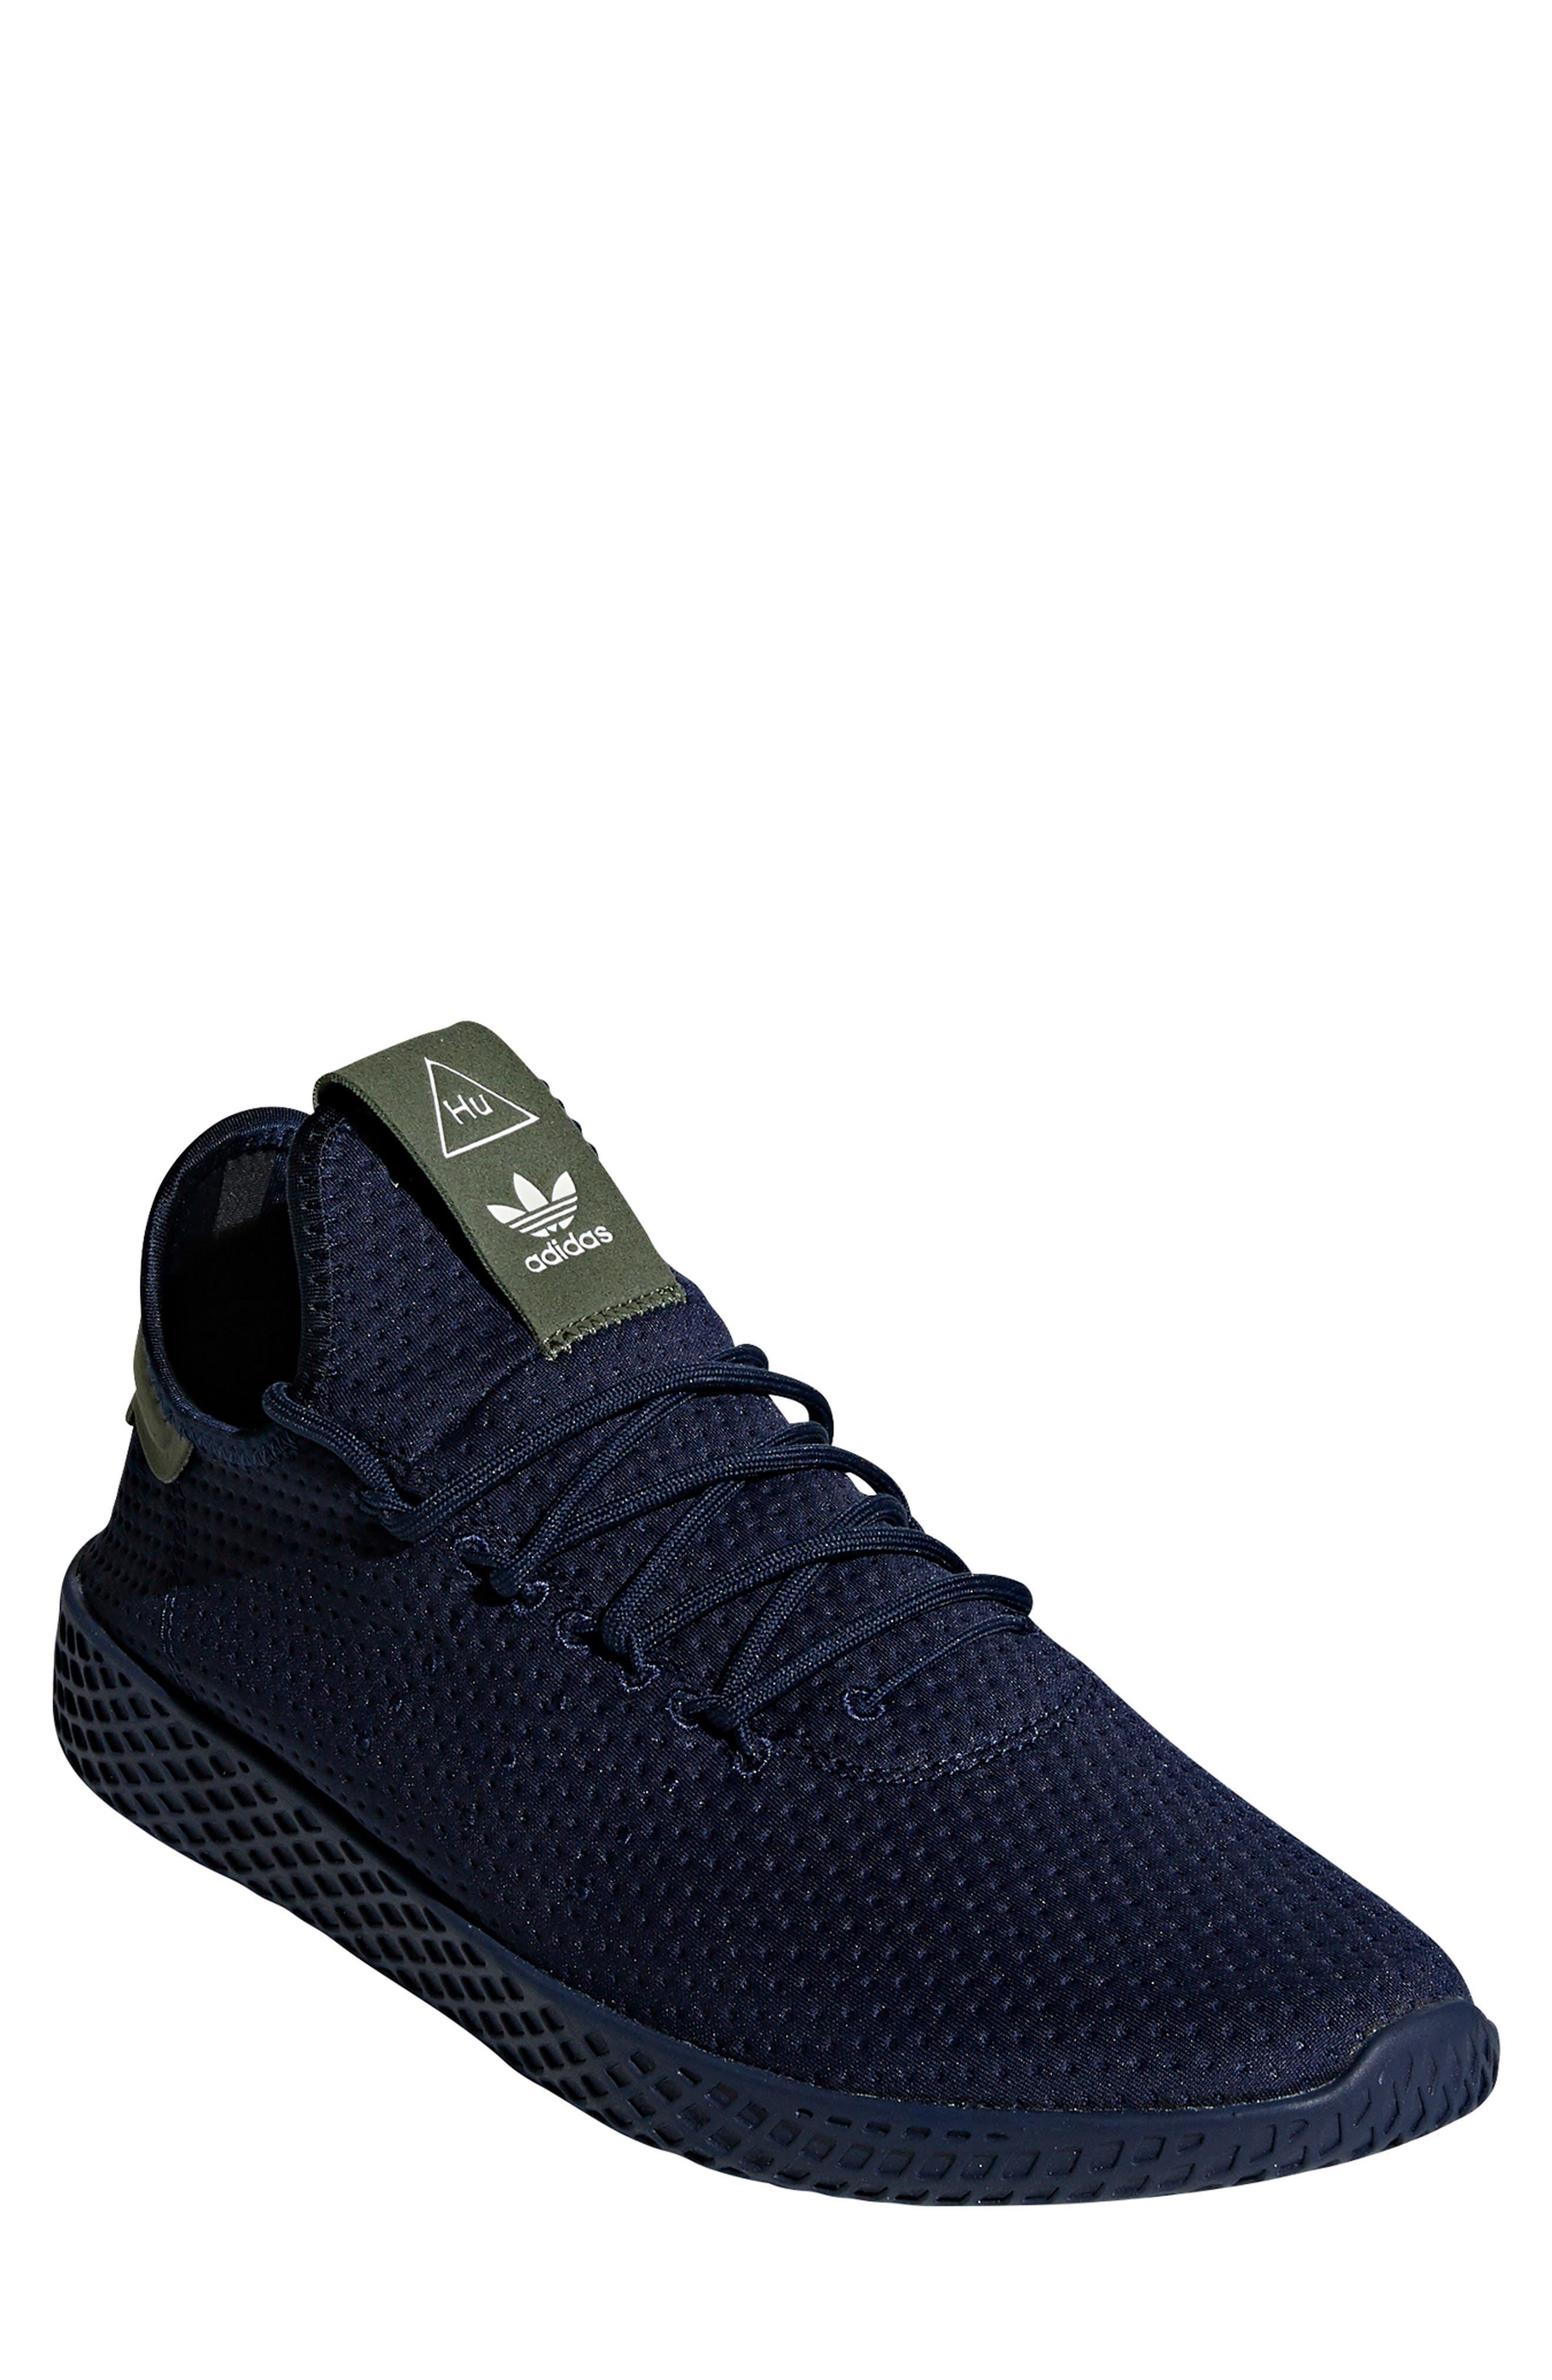 Pharrell Williams Tennis Hu Sneaker,                         Main,                         color, 415